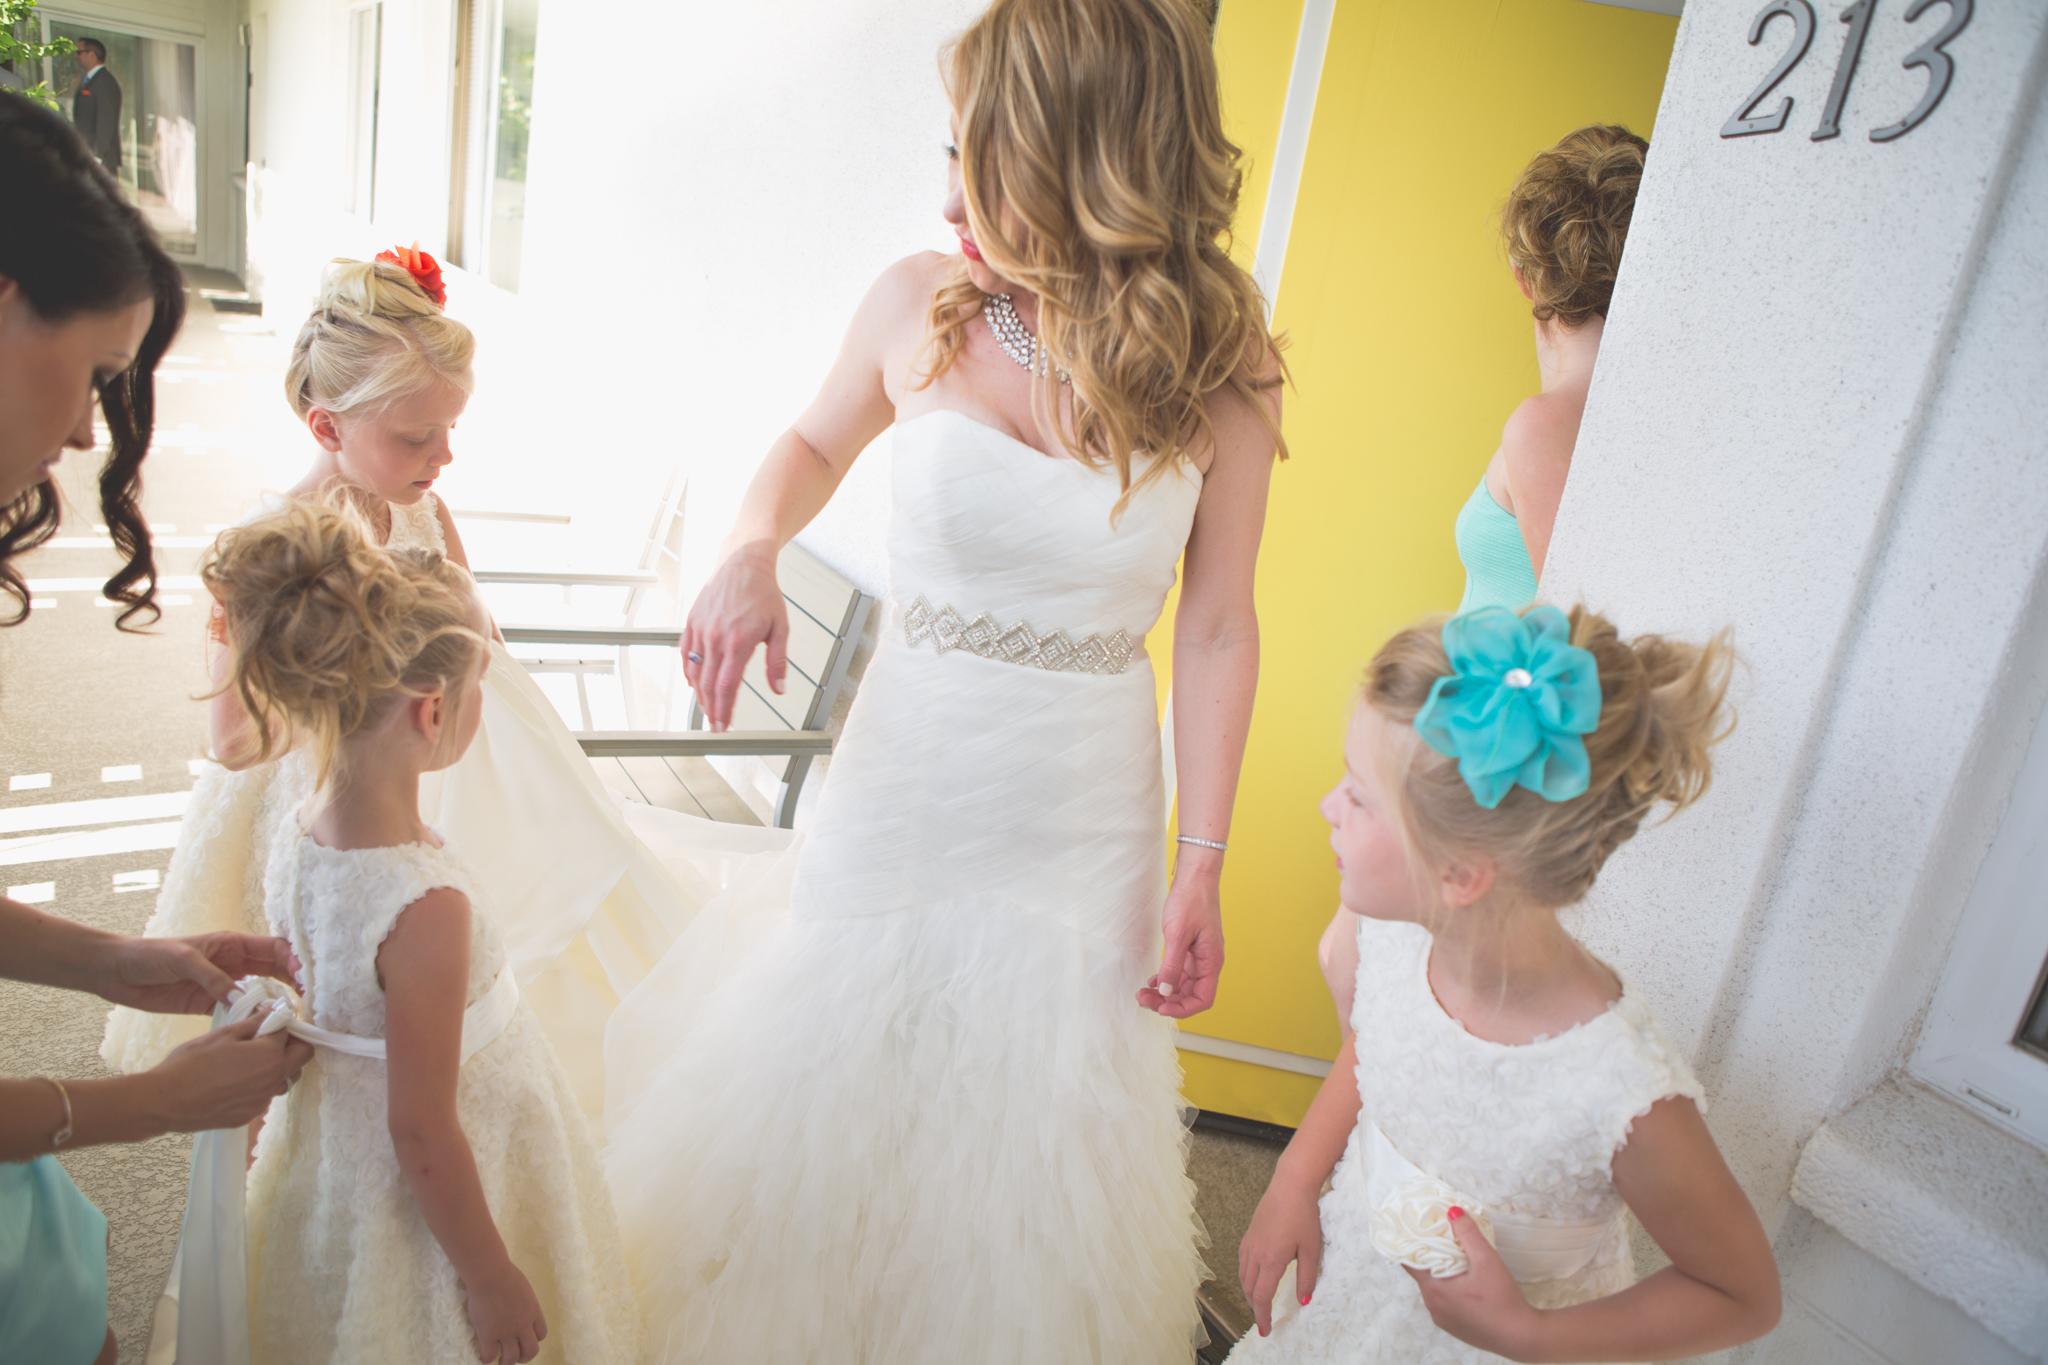 scottsdale-wedding-photographer-el-dorado-bride-flower-girls-getting-ready